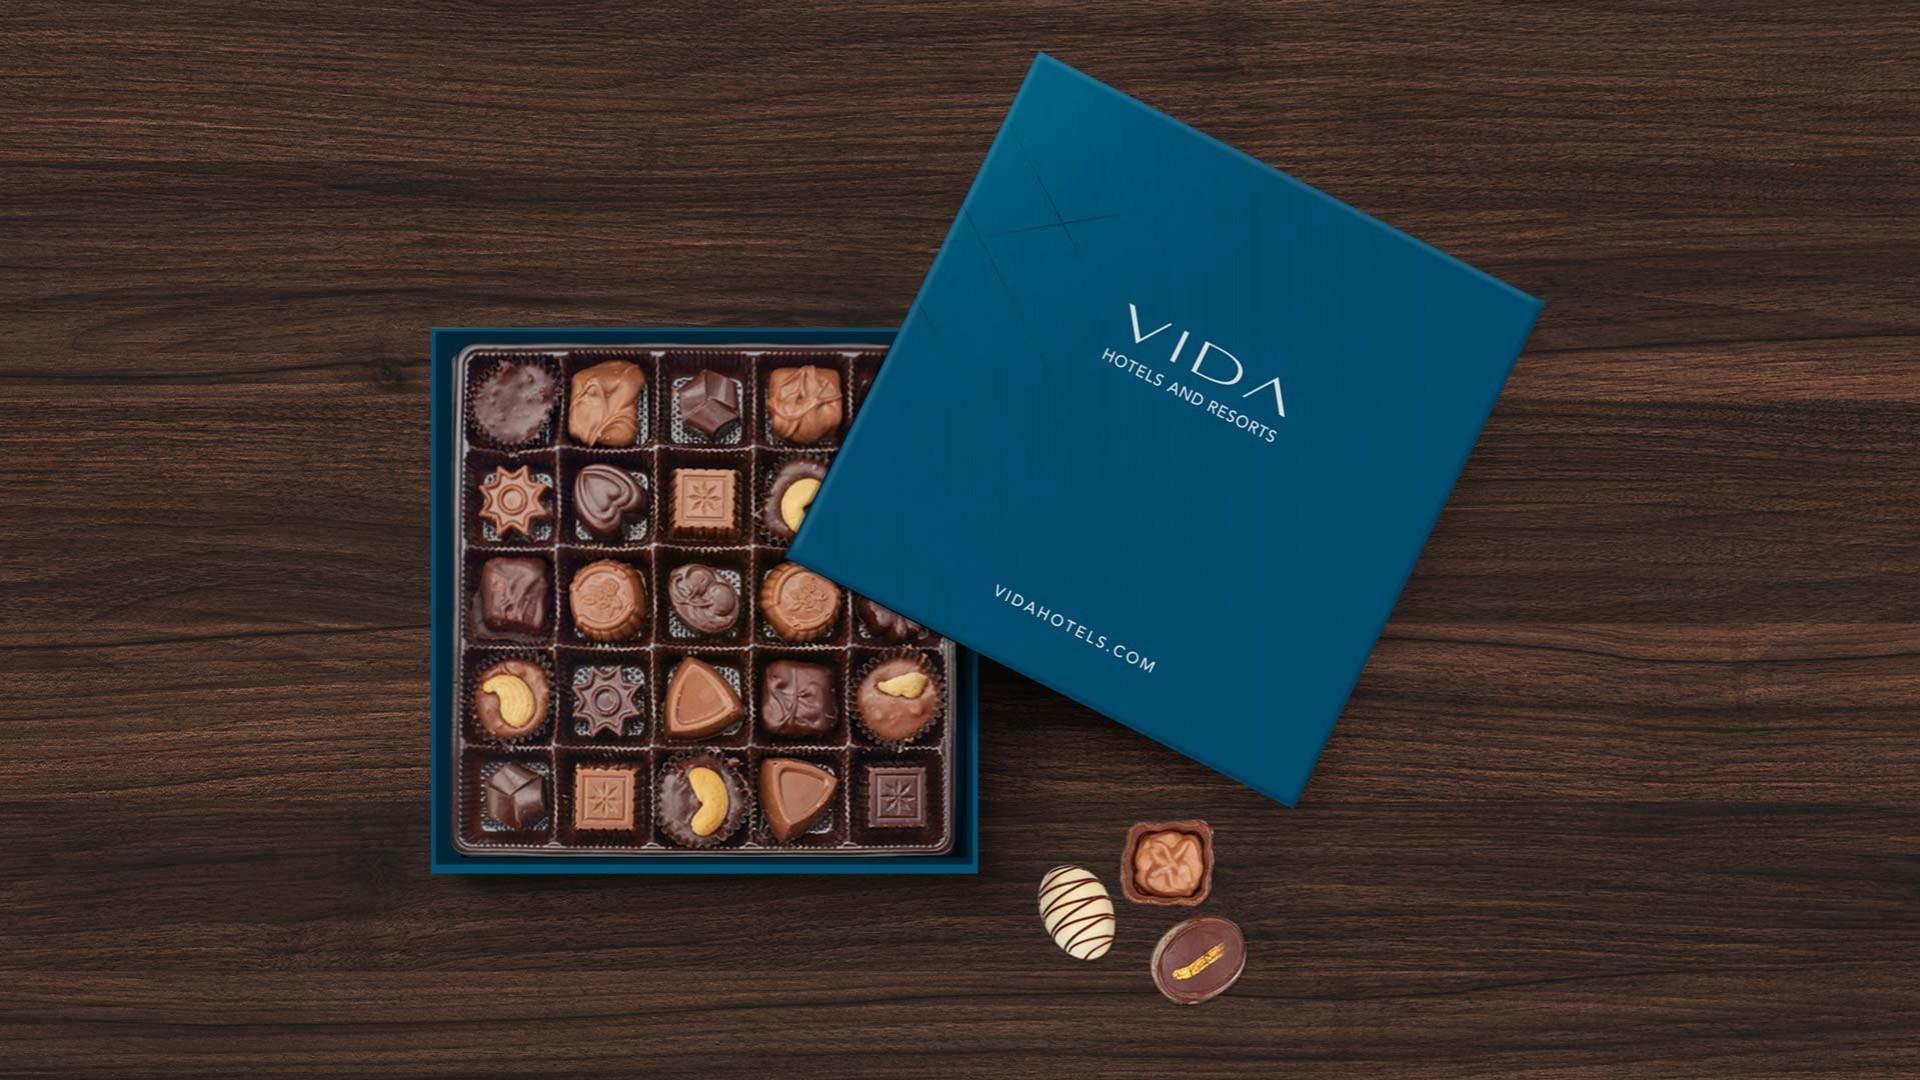 JOIE_BRANDS_VIDA_CHOCOLATE